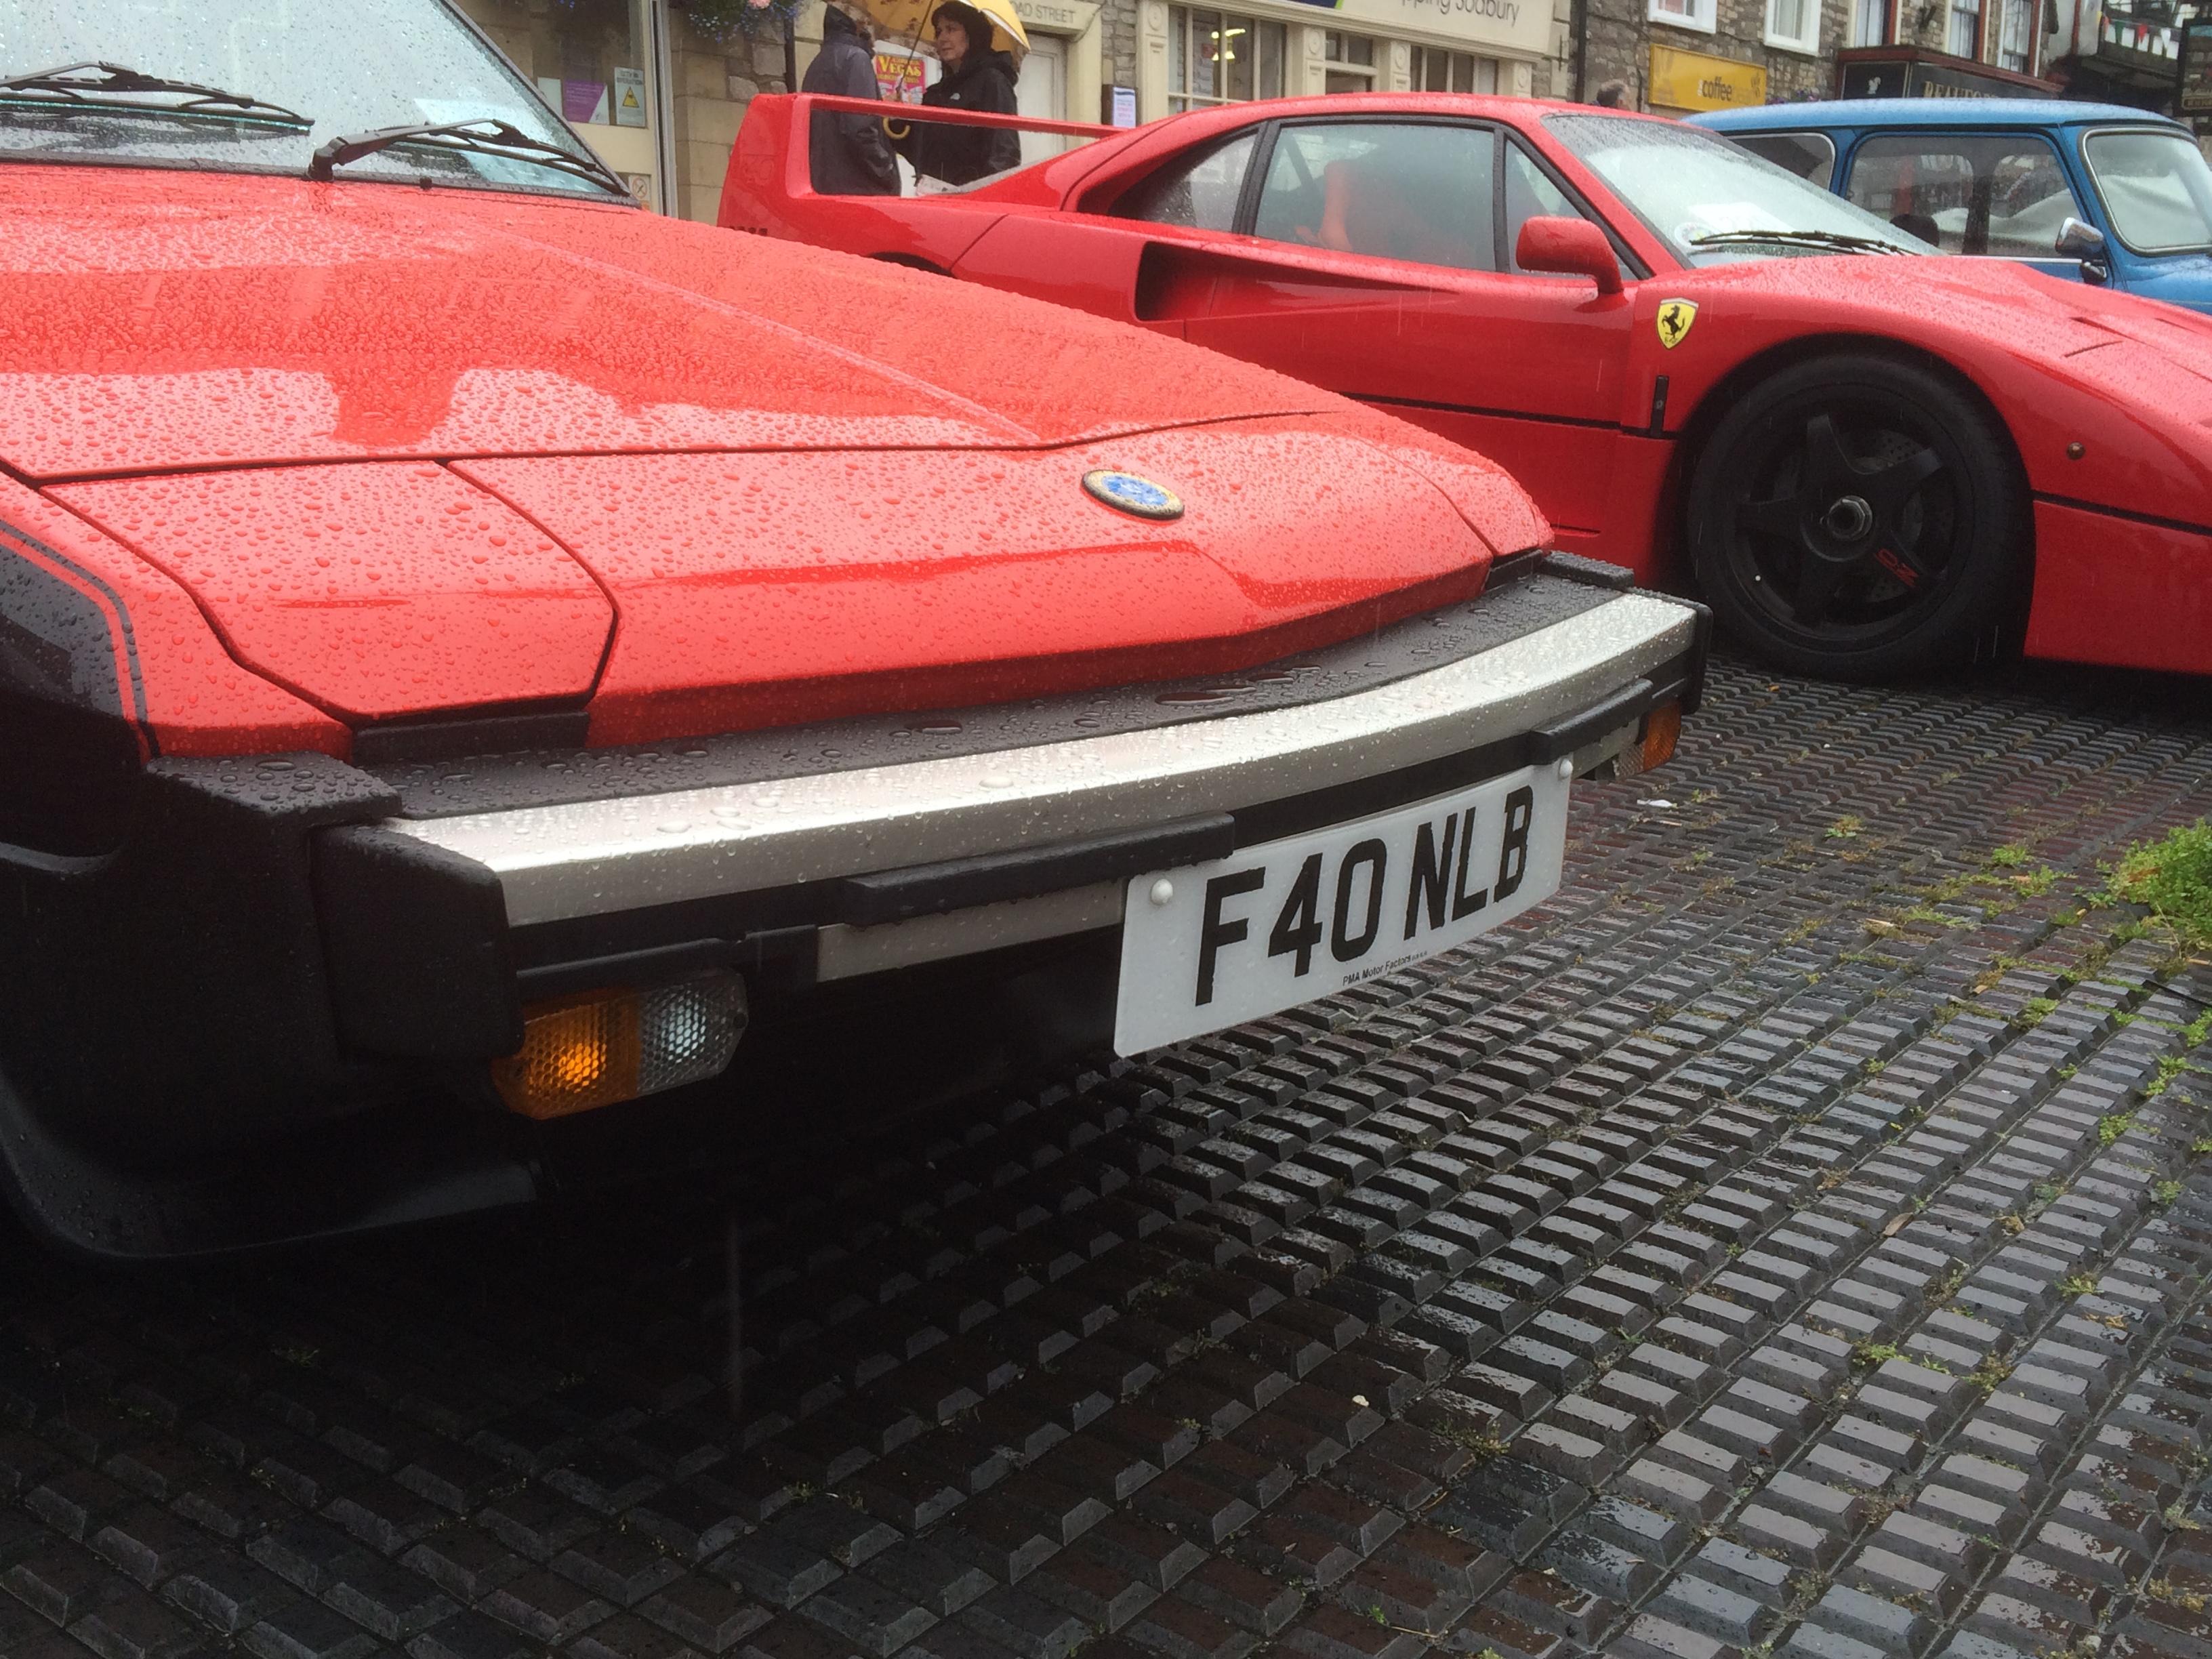 F40 Aspirations for Fiat X1/9